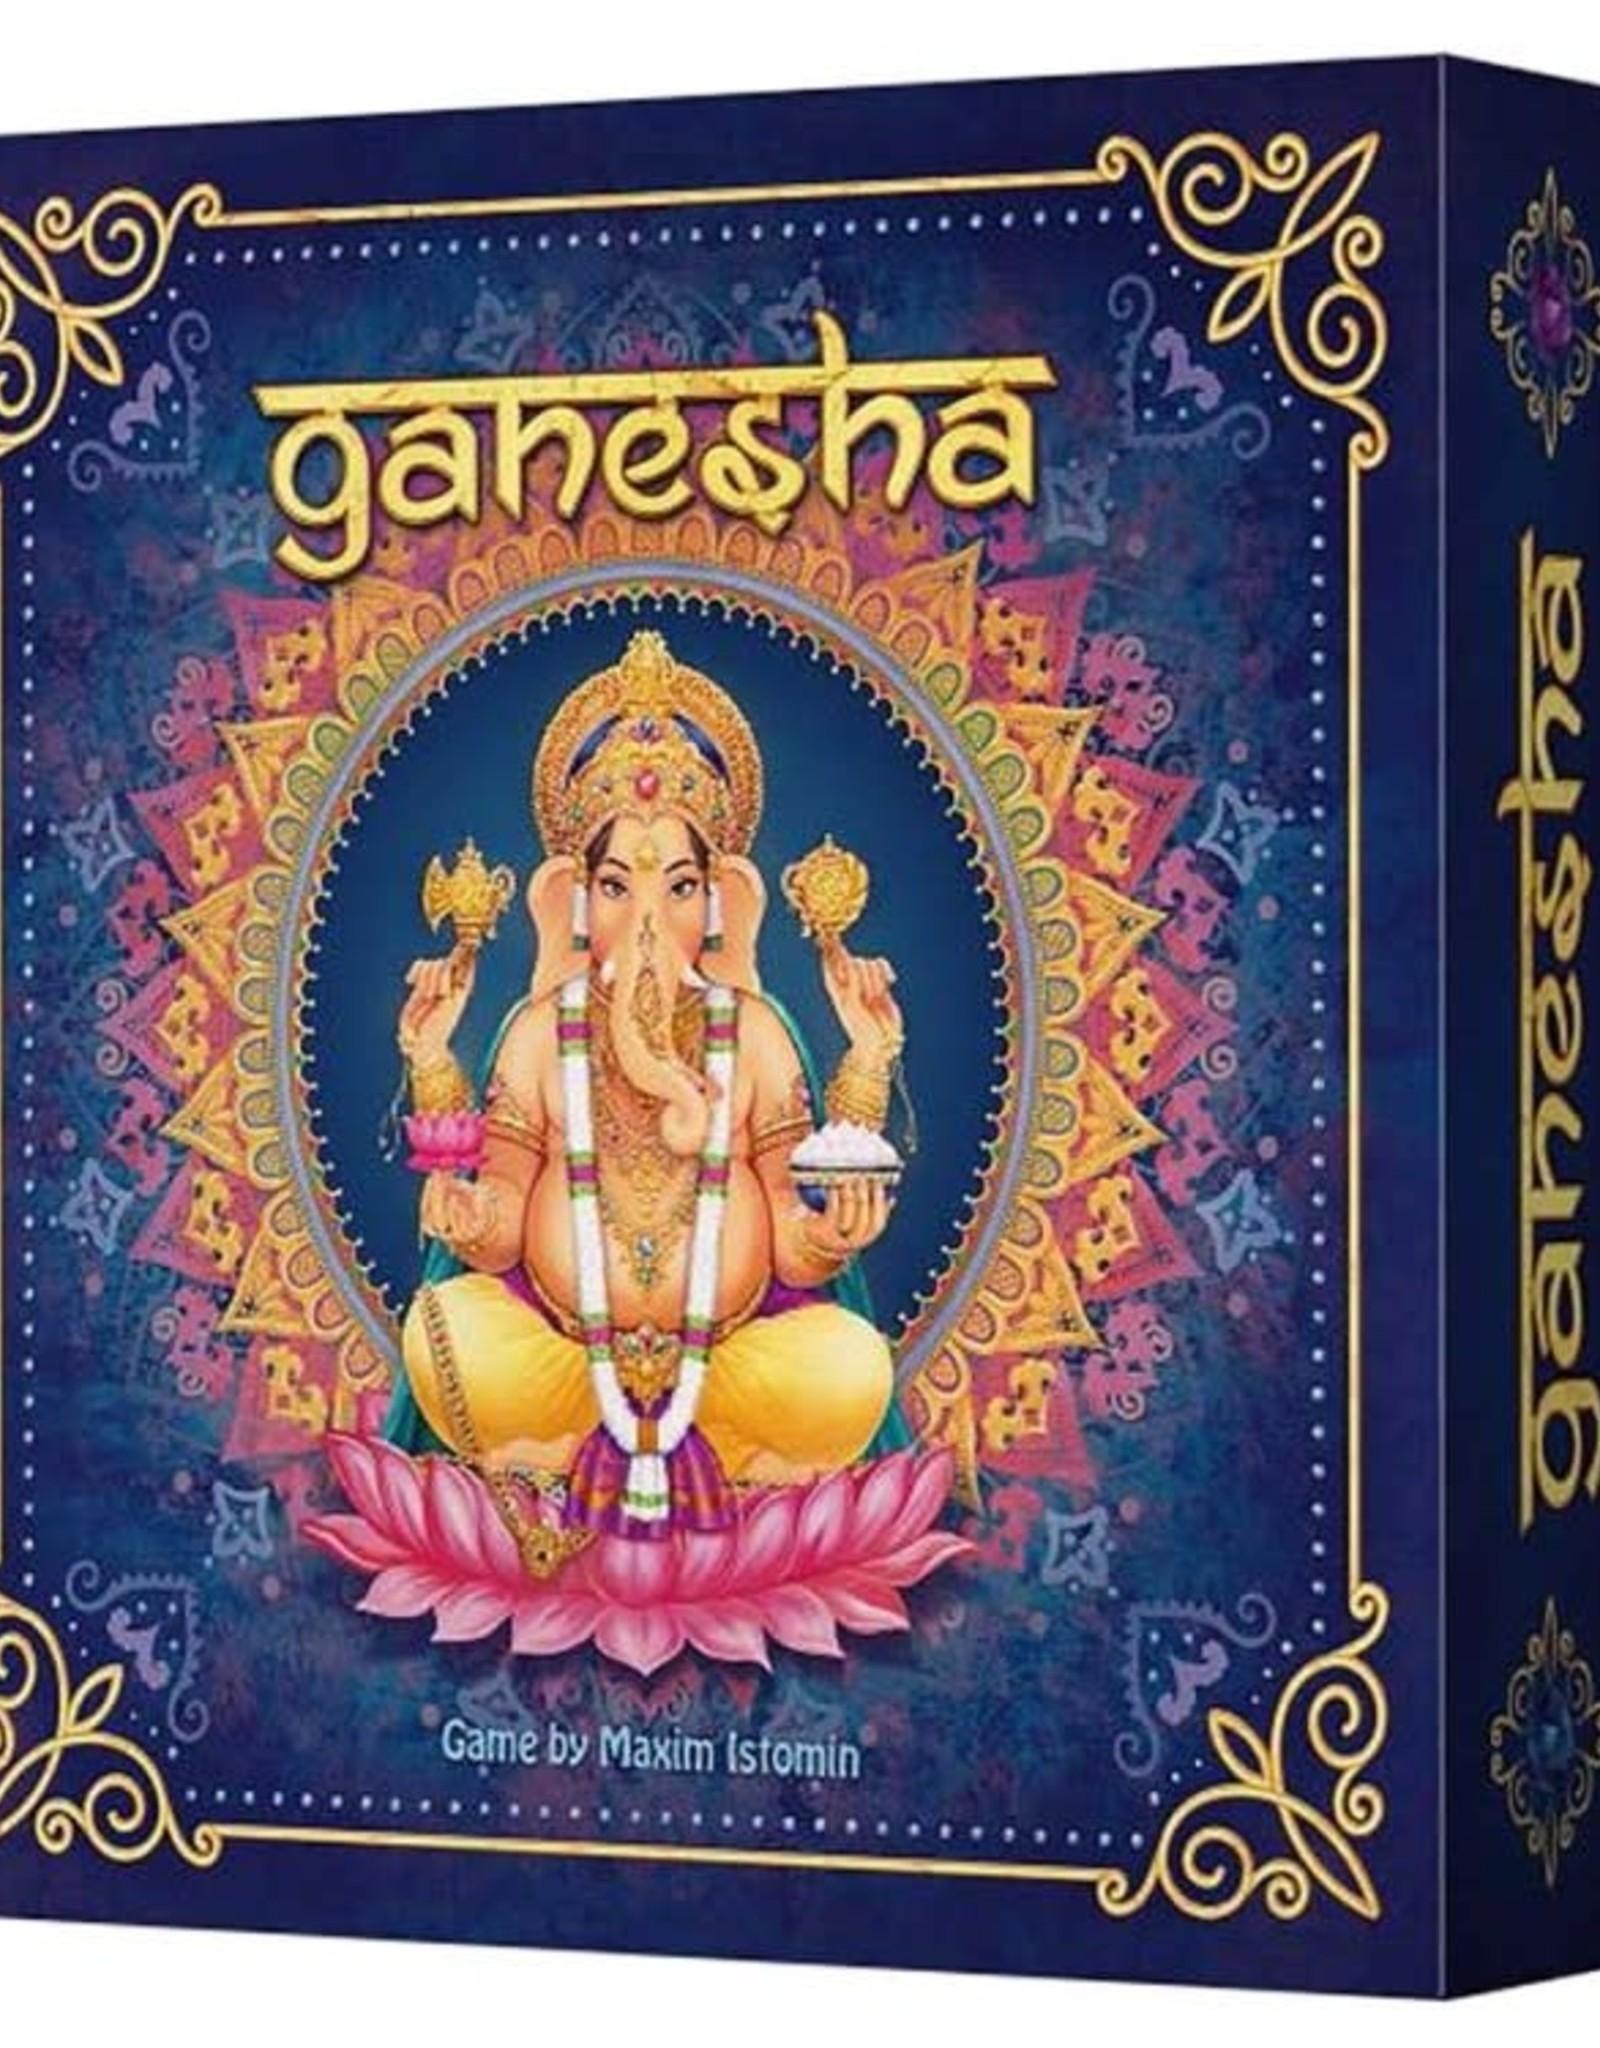 RENTAL - Ganesha 2 lb 3.8 oz